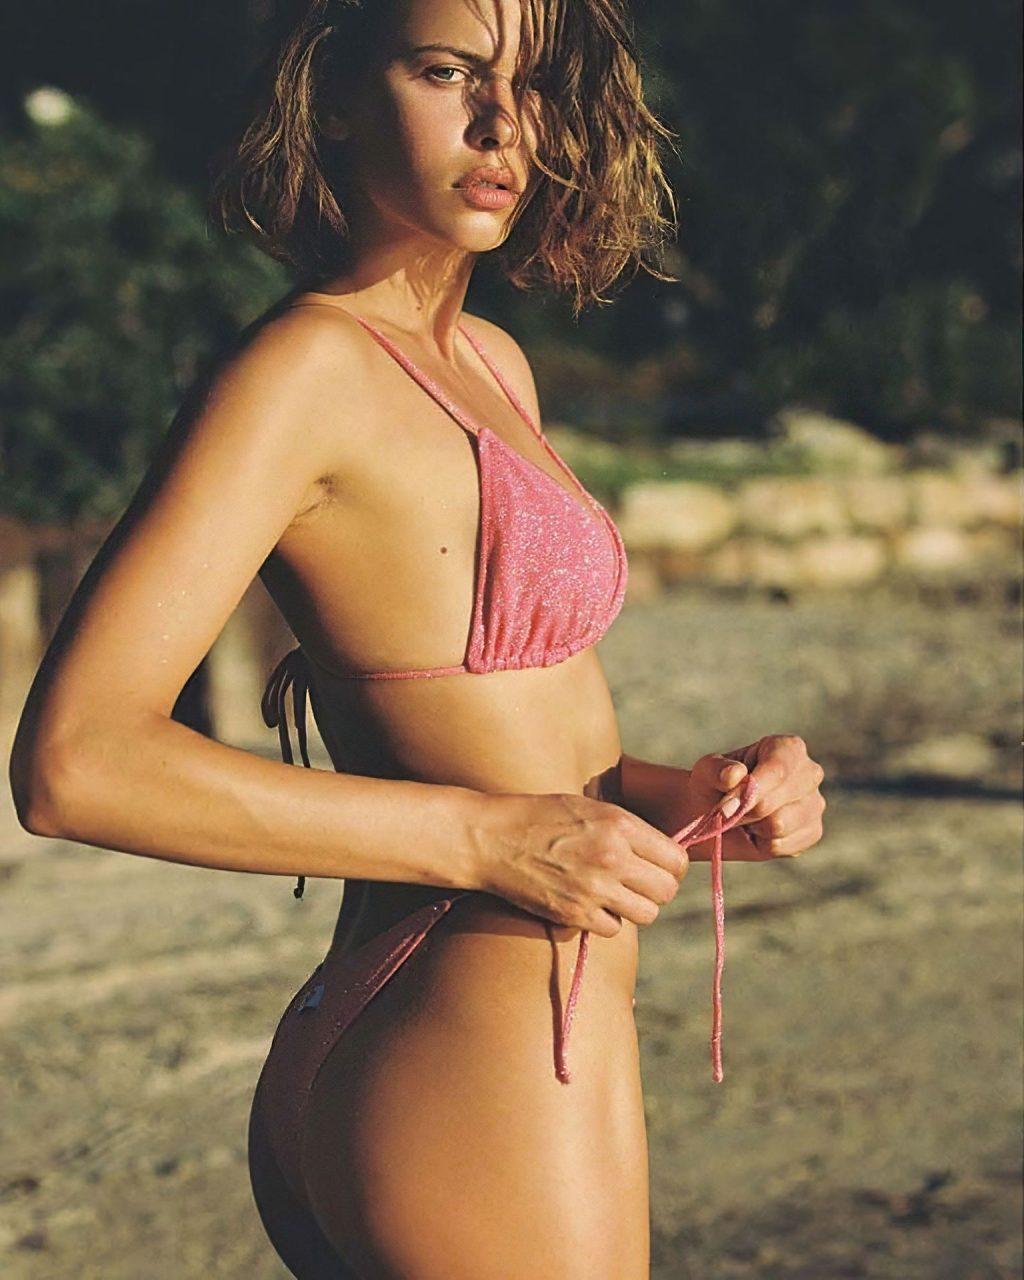 Georgia Fowler Shows Off Her Sexy Bikinis (18 Photos)